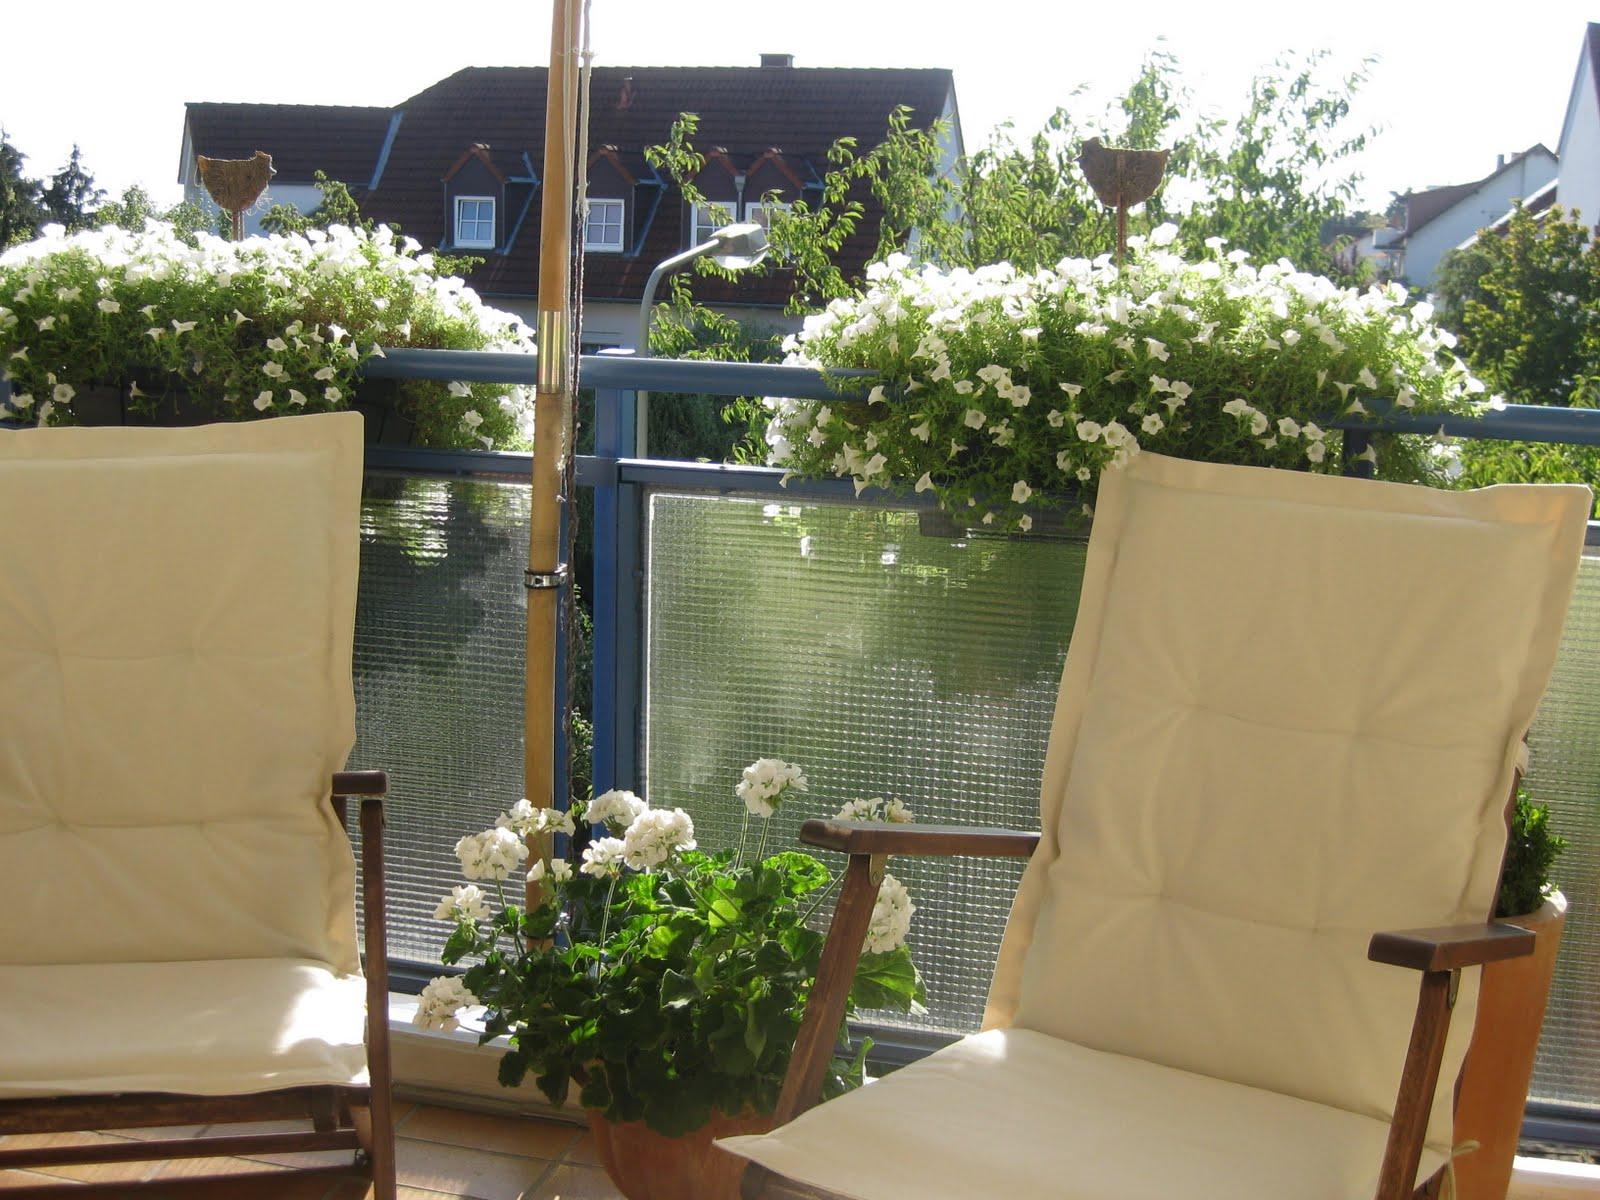 my house of ideas projekt auf dem balkon. Black Bedroom Furniture Sets. Home Design Ideas